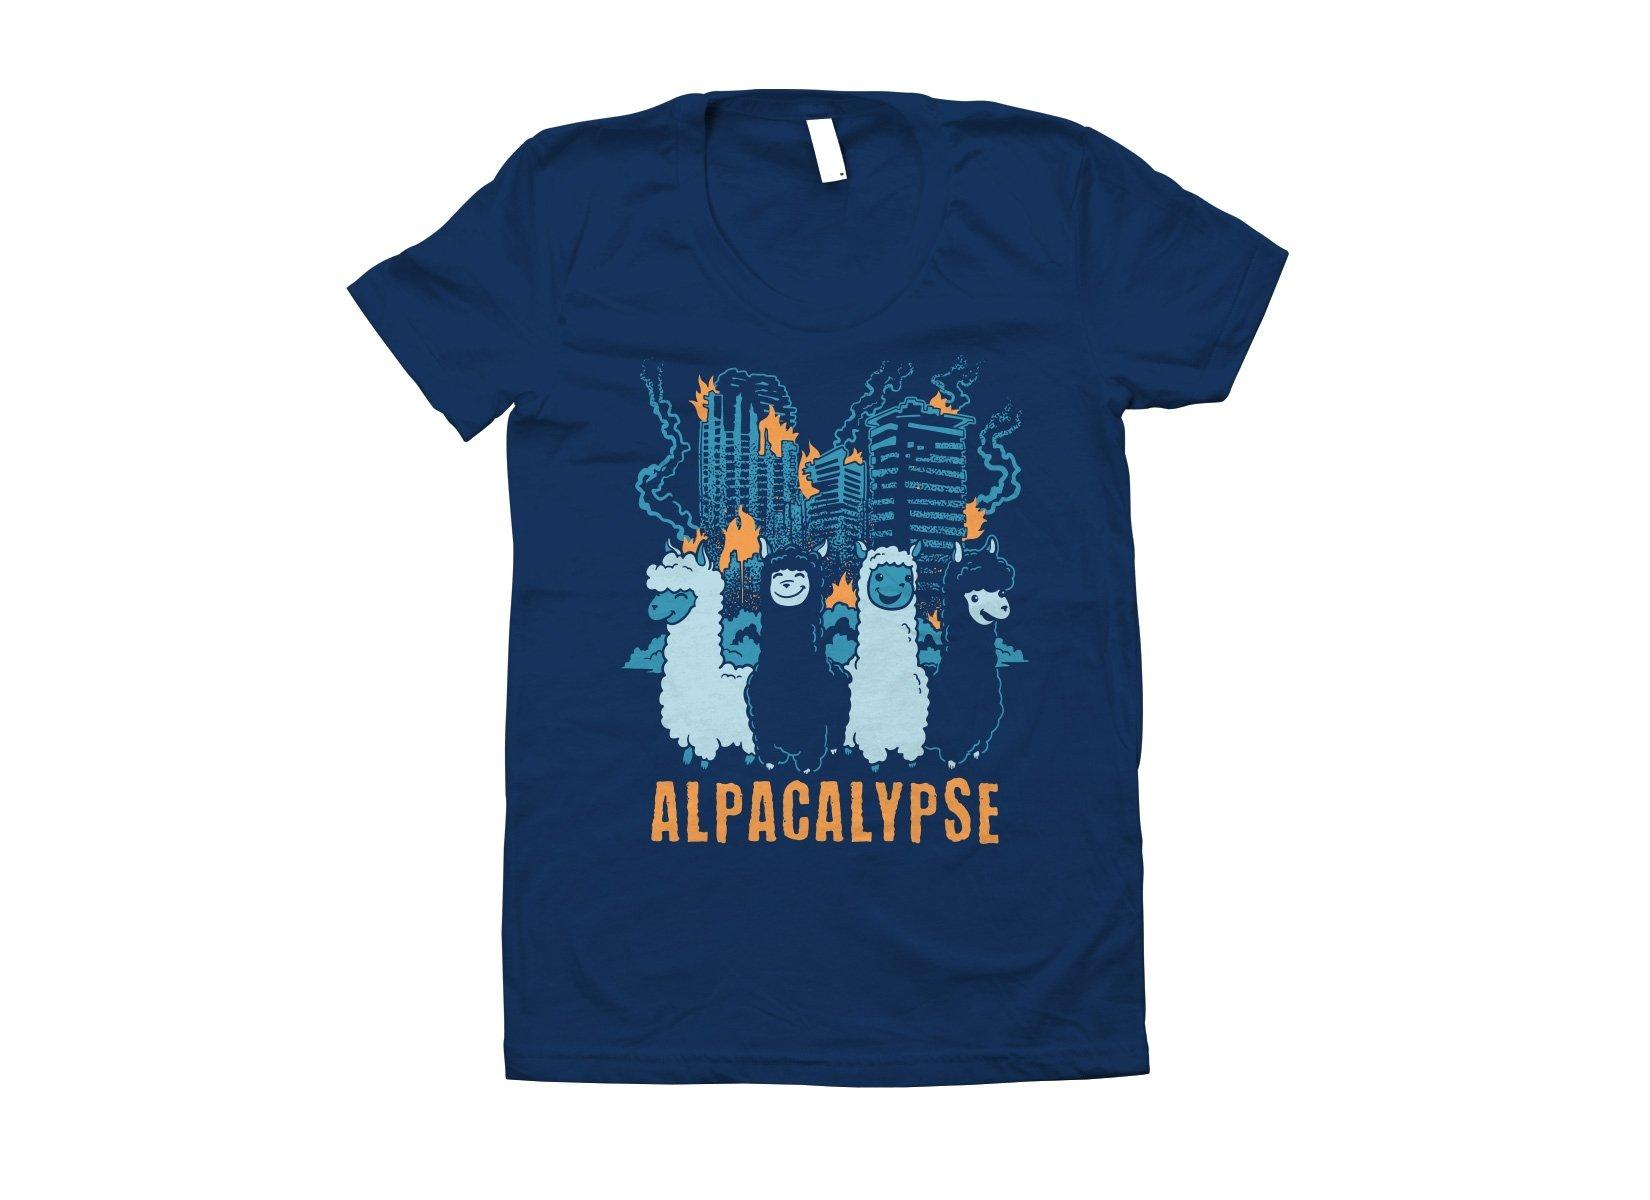 Alpacalypse on Juniors T-Shirt